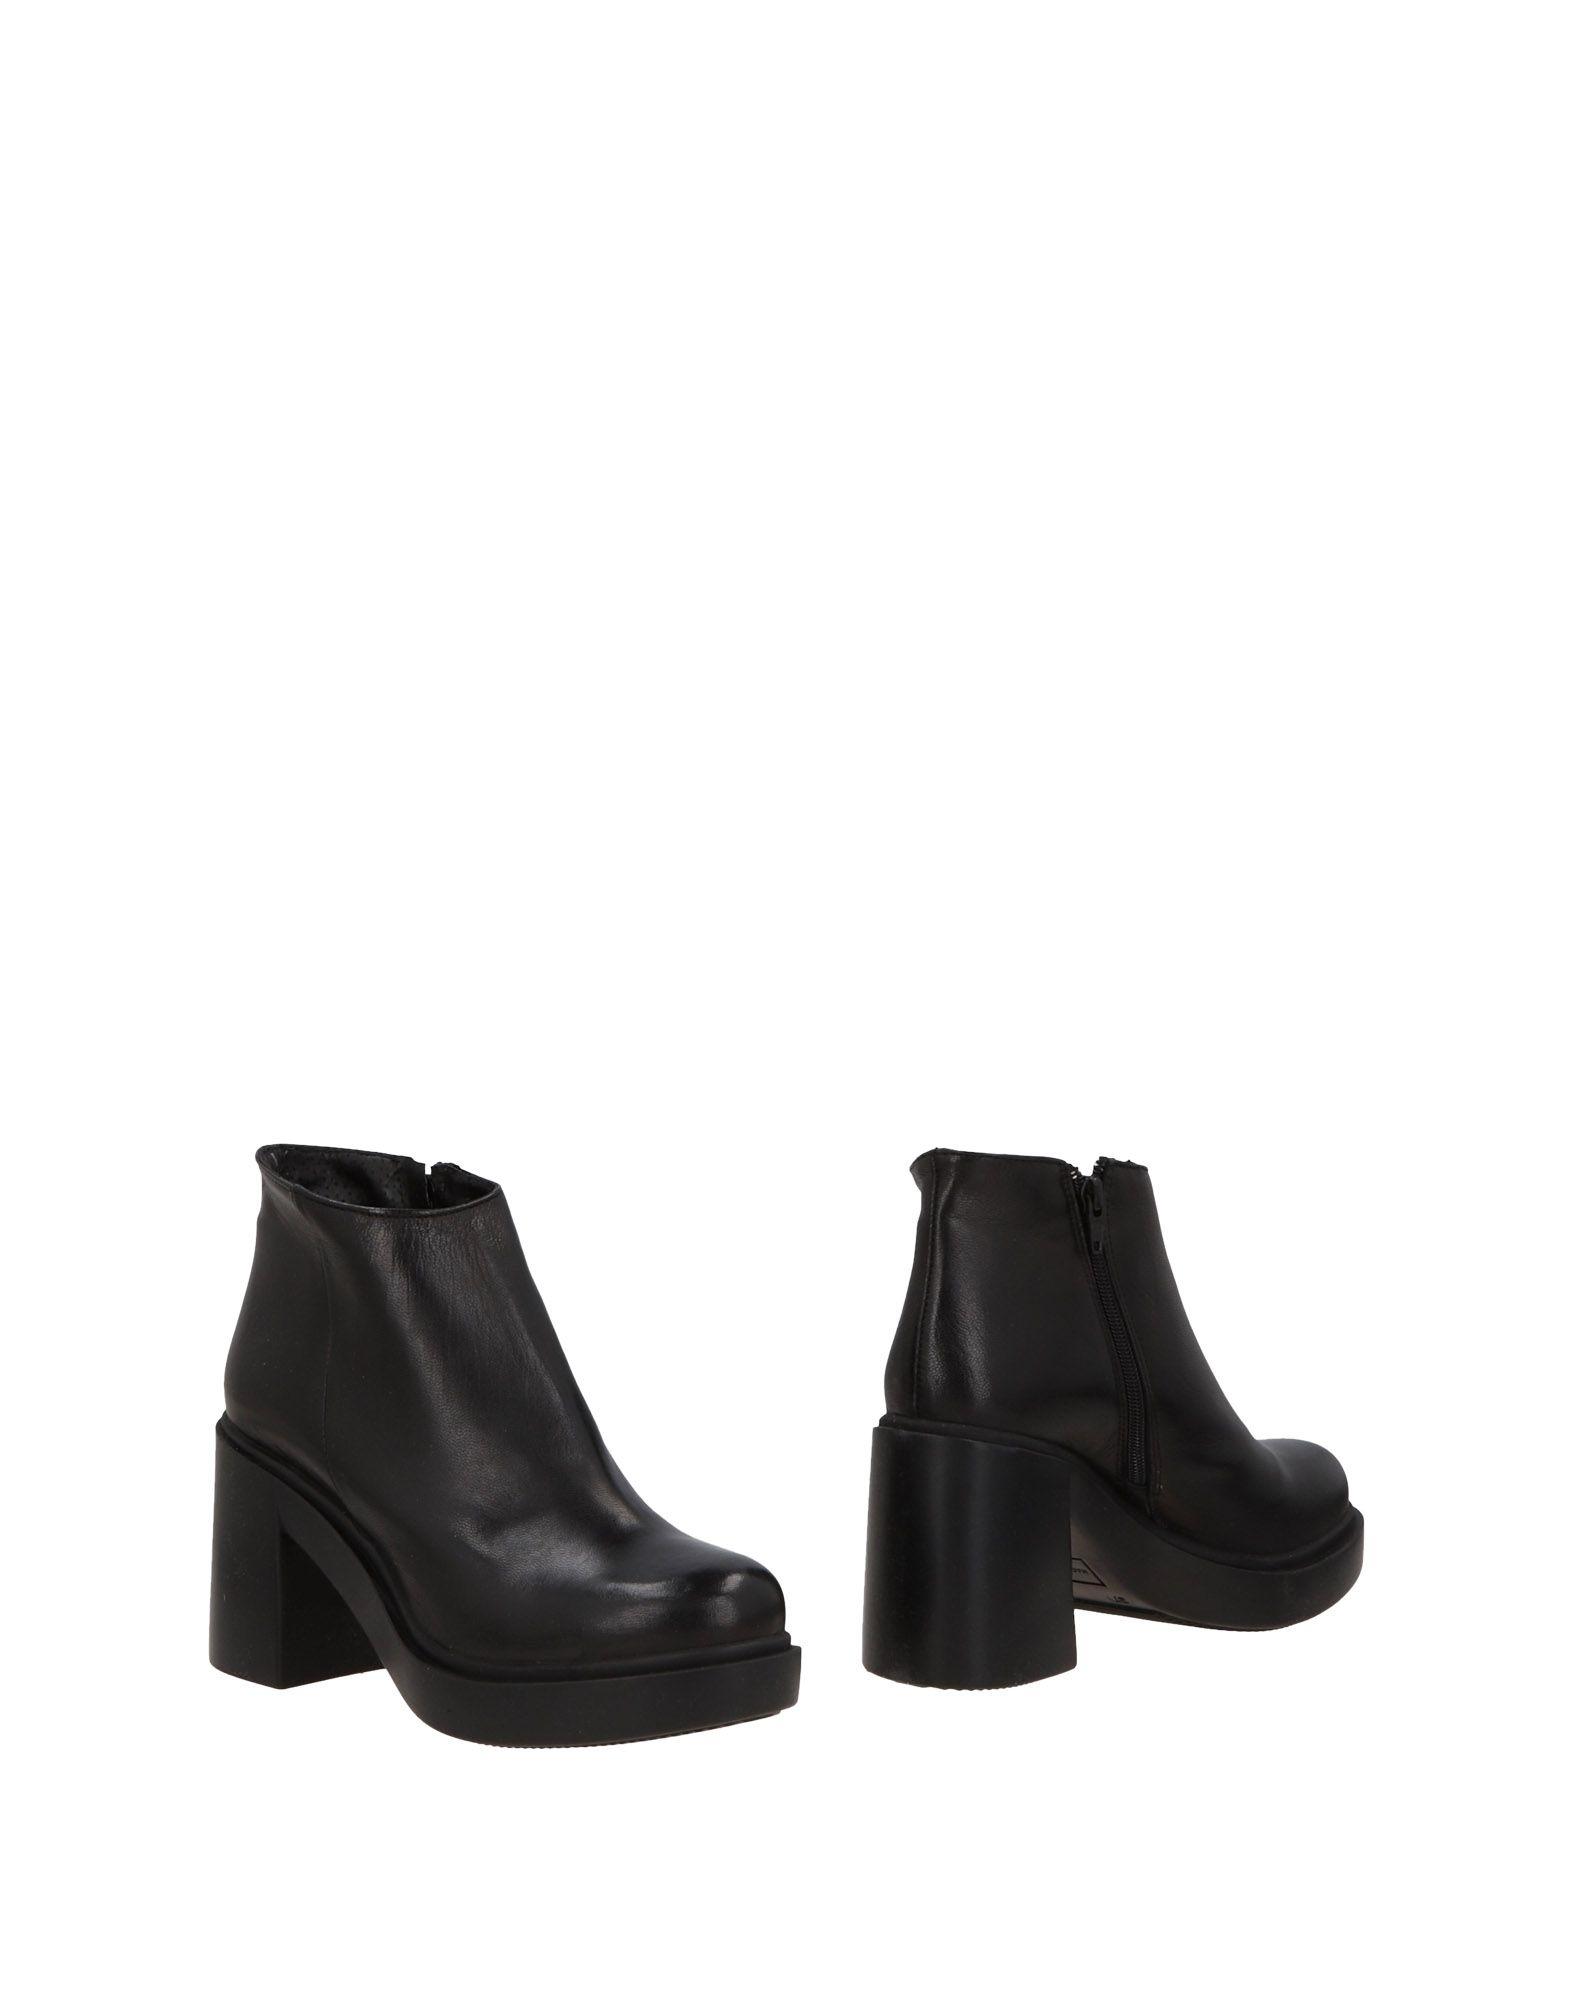 Unlace Stiefelette Damen beliebte  11474877CC Gute Qualität beliebte Damen Schuhe e35f31